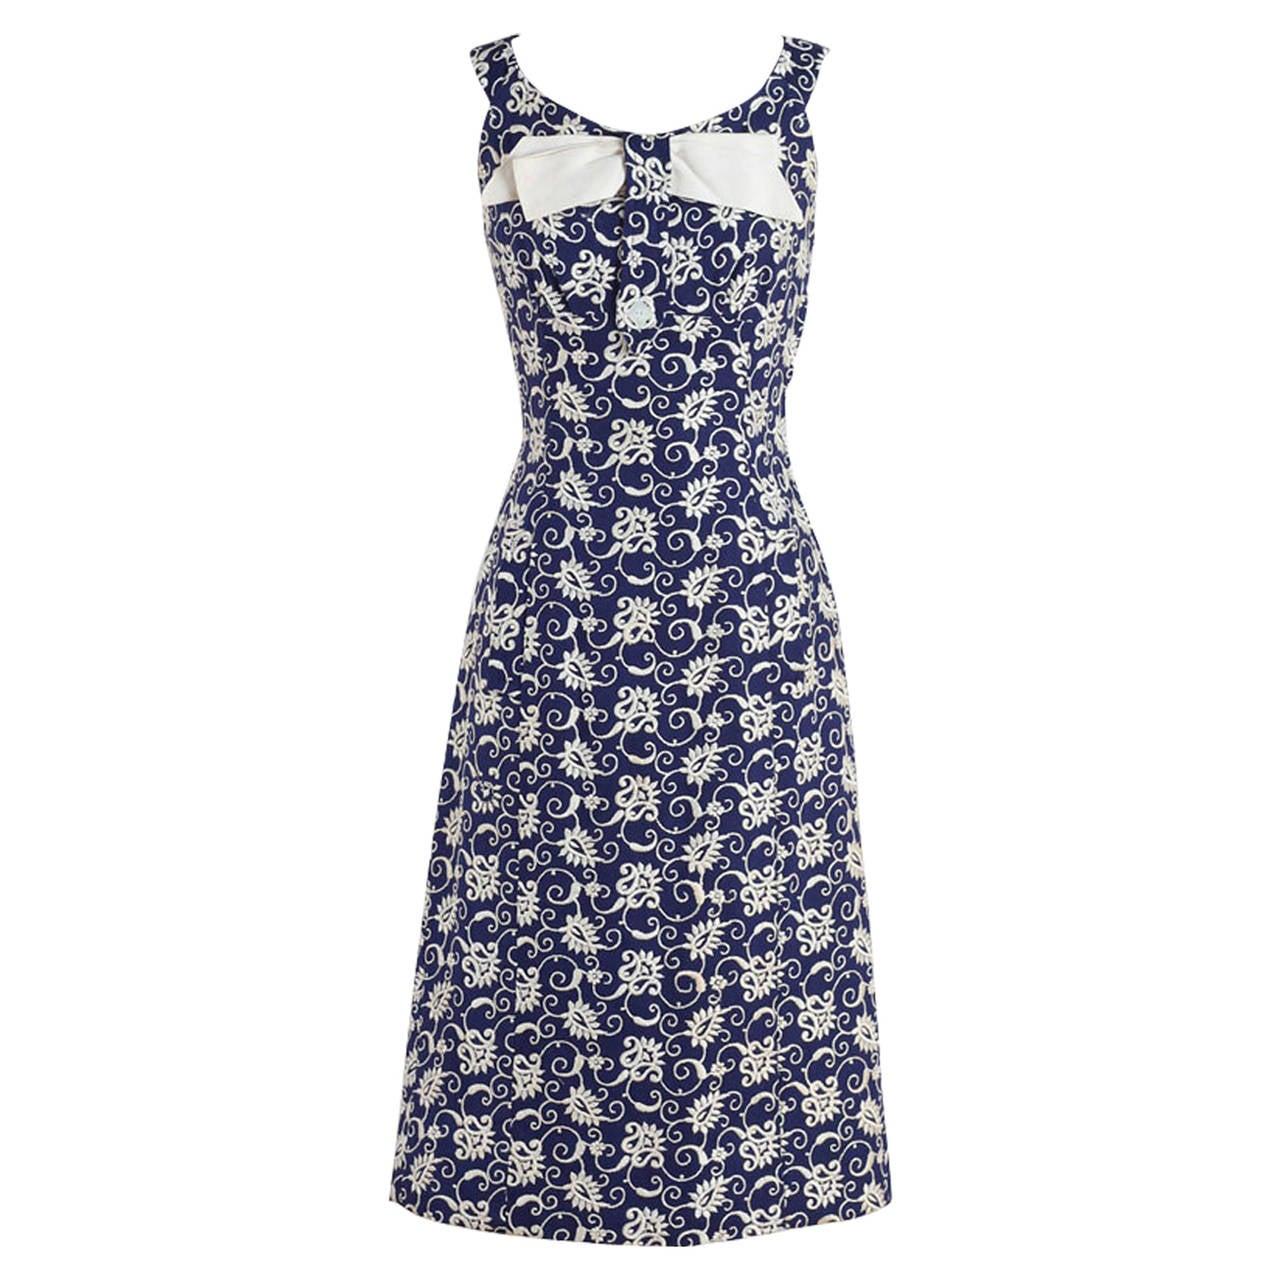 Vintage s navy embroidered irish linen dress at stdibs